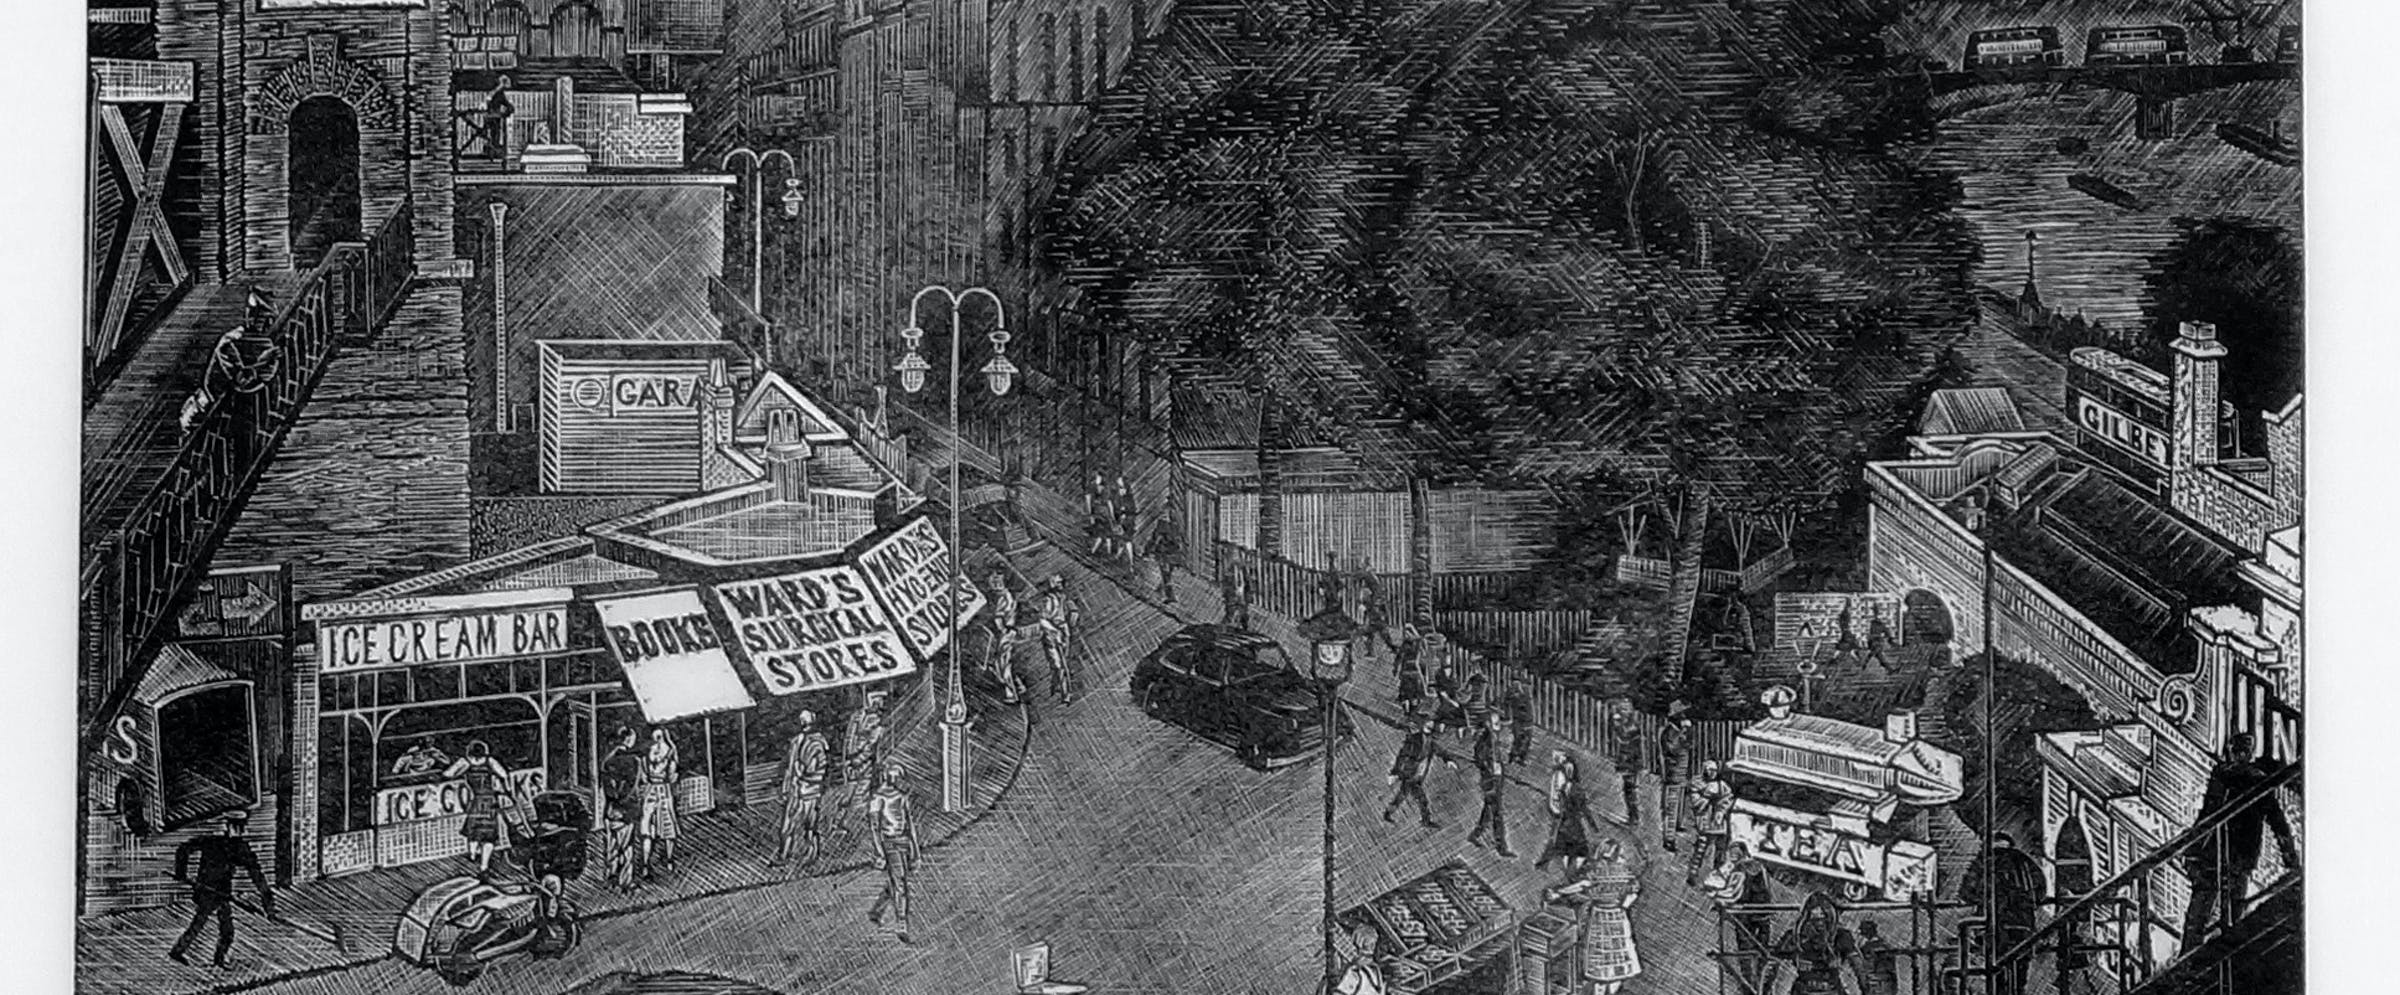 Erik Wessel-Fougstedt (1915-1990; svensk): Gatemotiv, London, (1960), trestikk